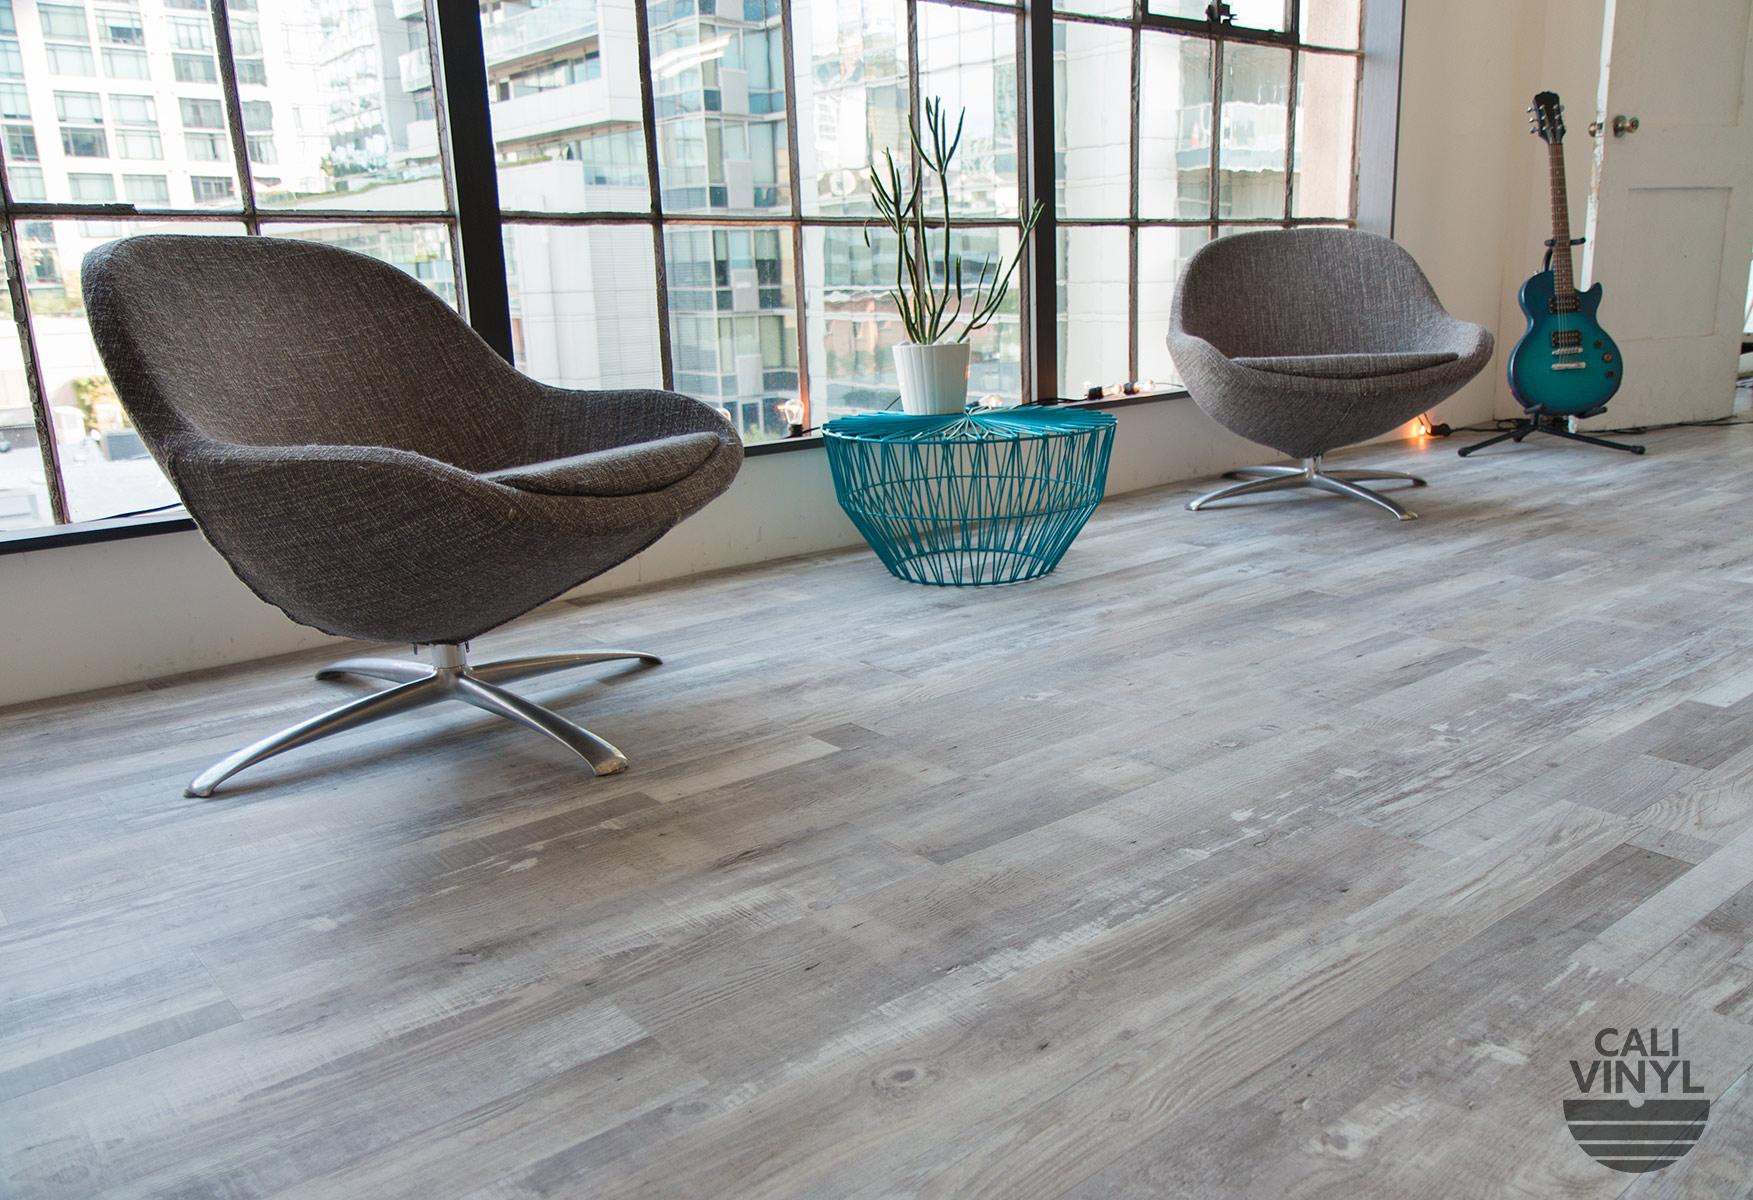 Cali bamboo remasters vinyl flooring for Cali bamboo cork flooring